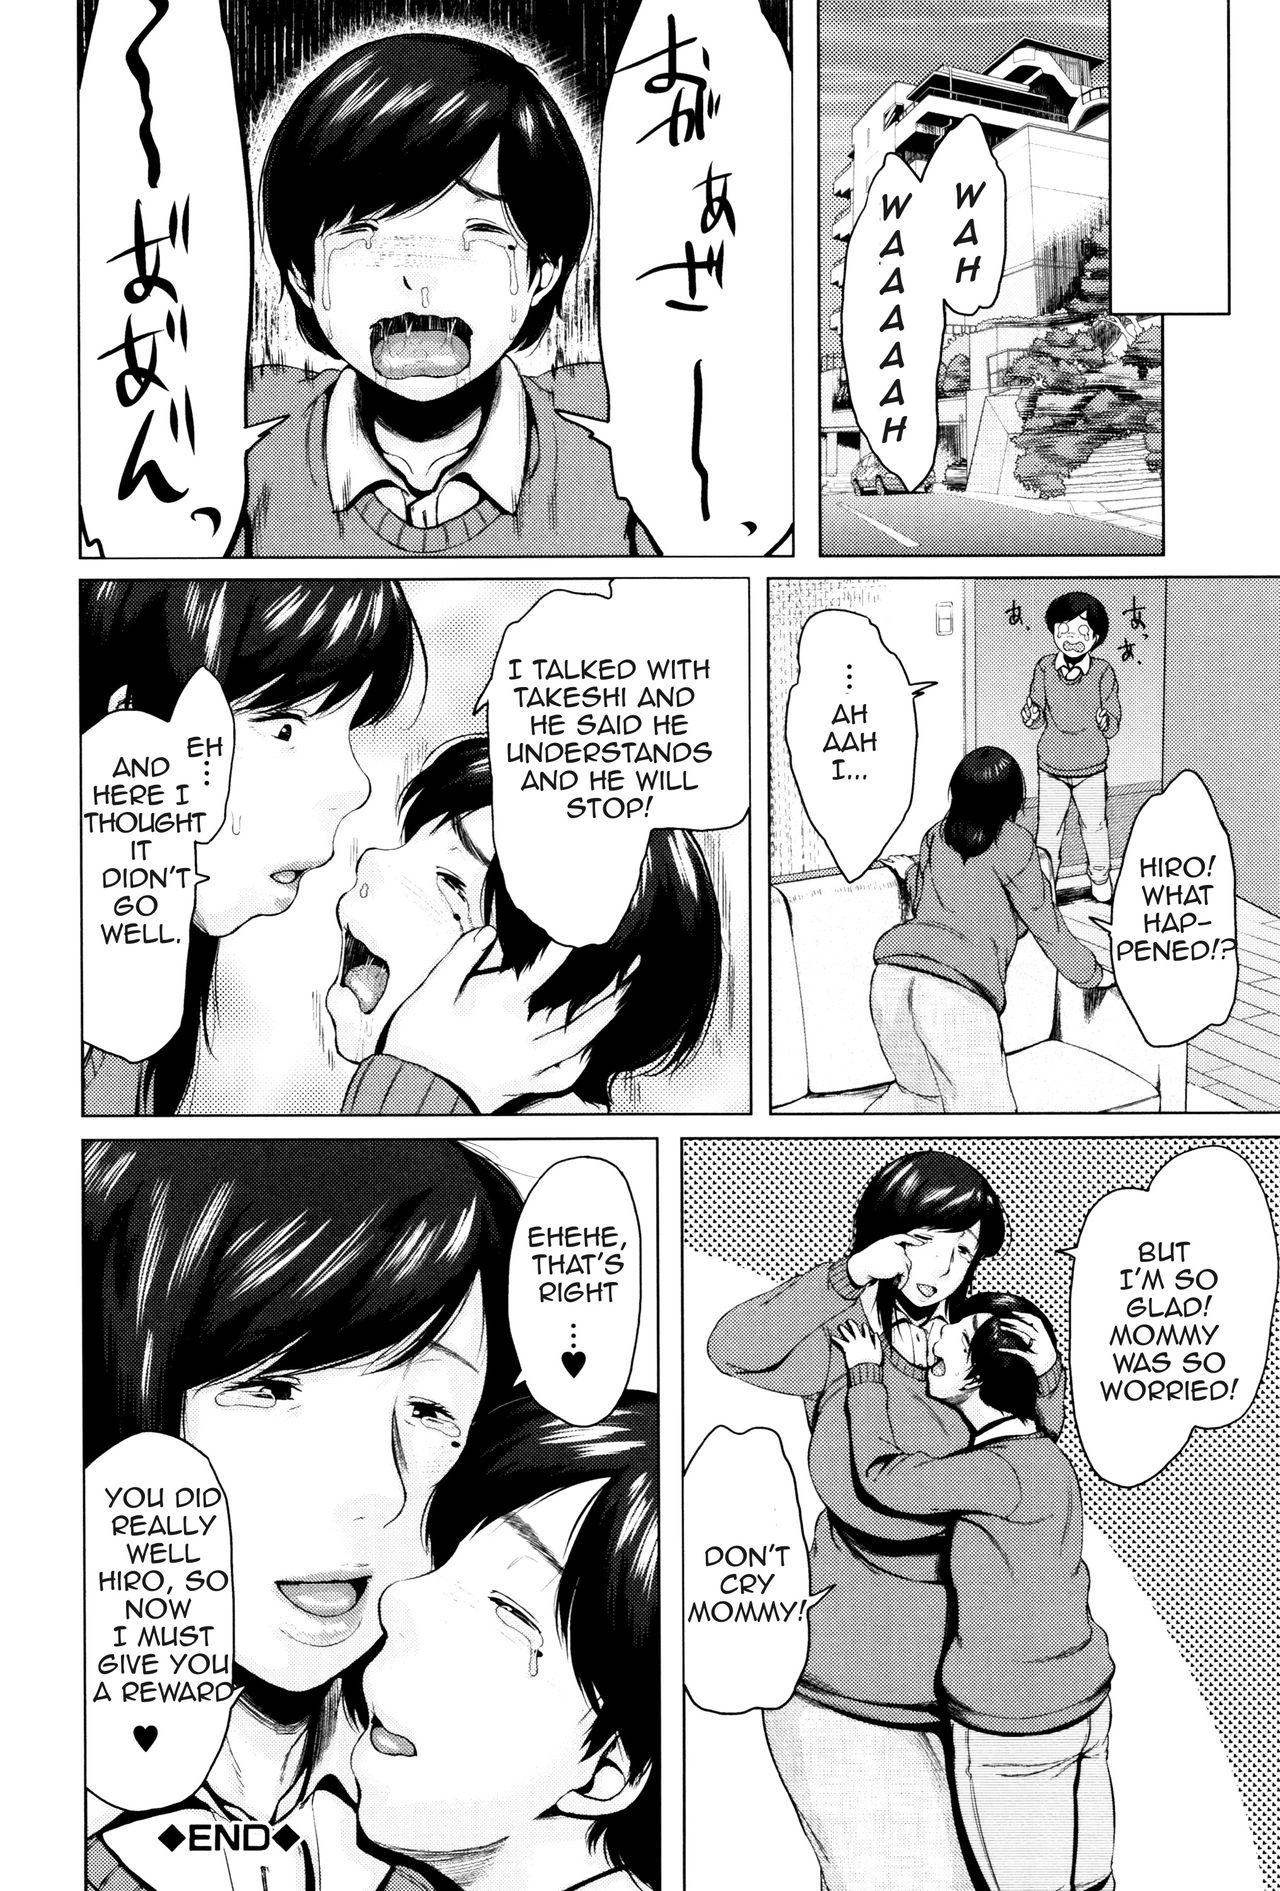 [Jitsuma] Kinyoubi no Haha-tachi e - To Friday's mothers [English] [Amoskandy, desudesu, Kusanyagi] 168